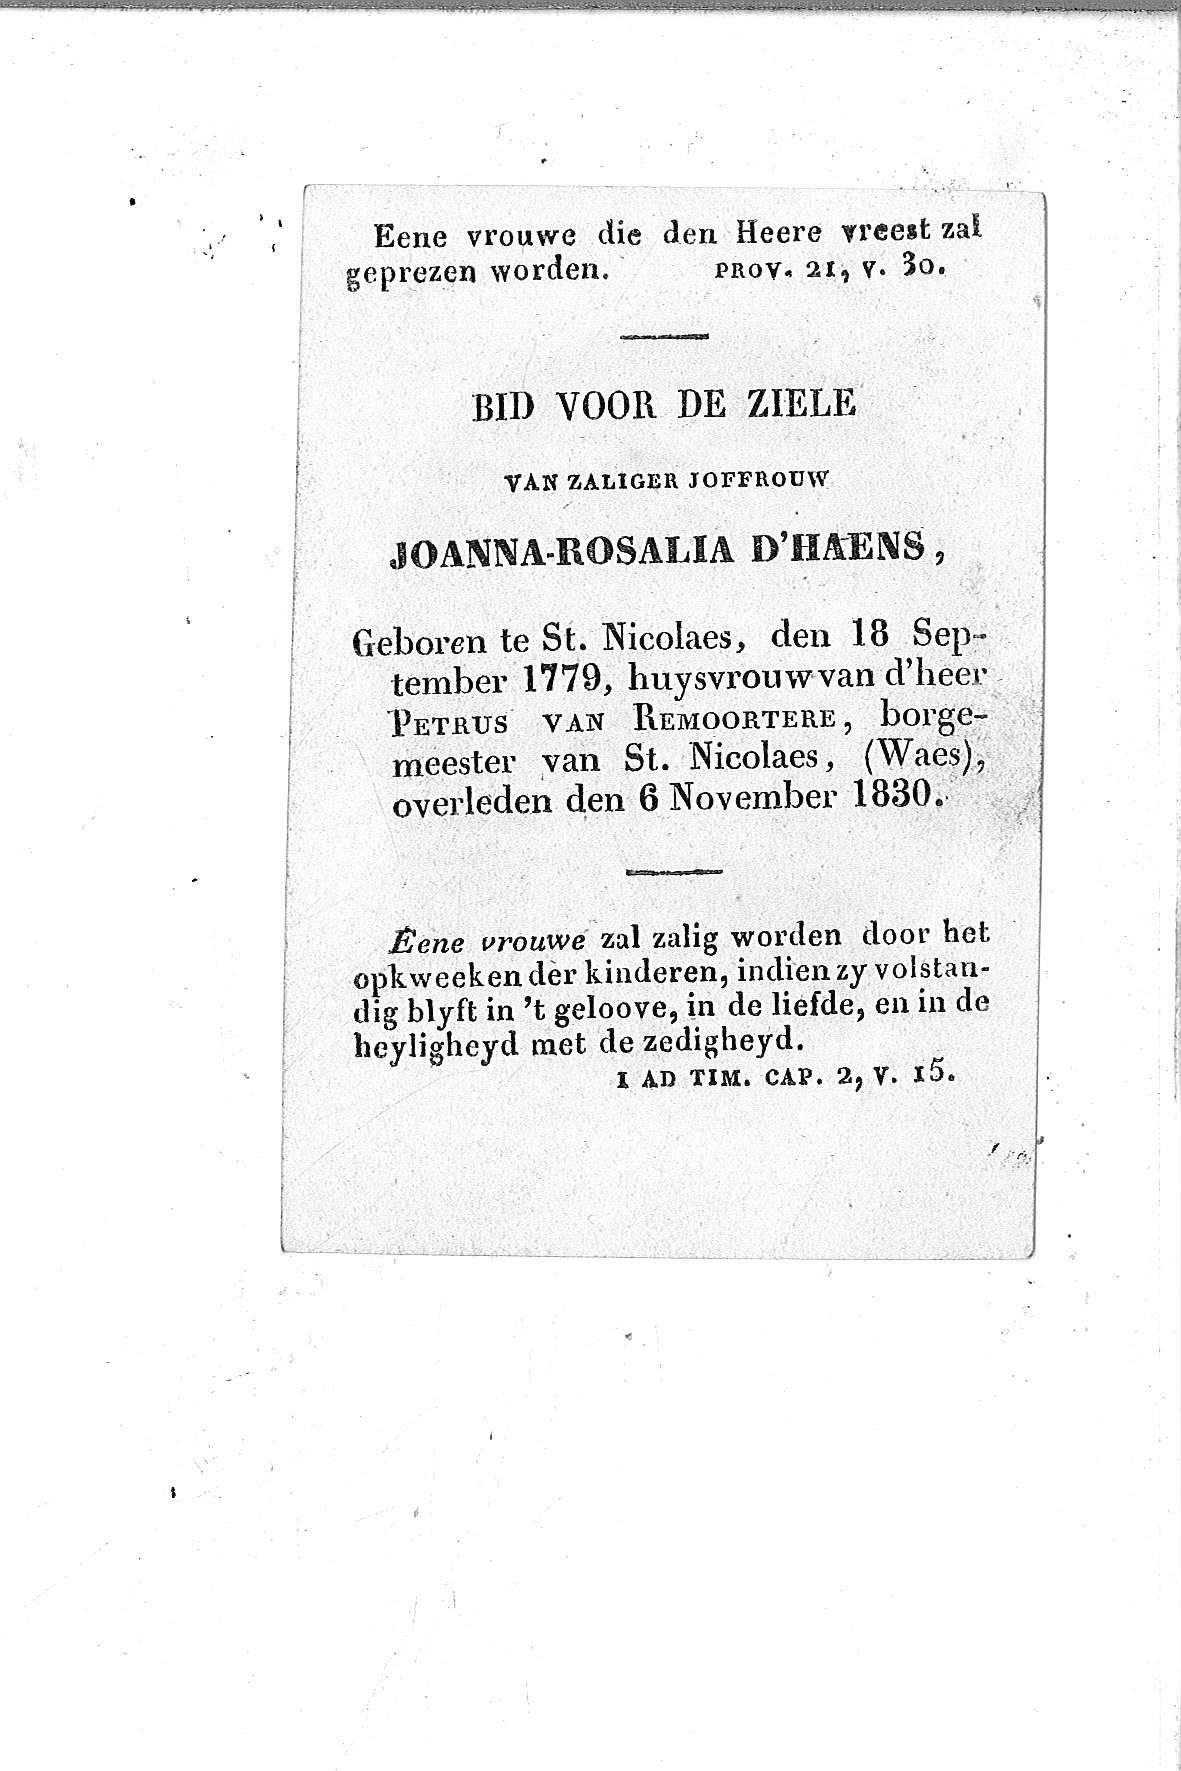 Joanna-Rosalia-(1830)-20120919084524_00001.jpg